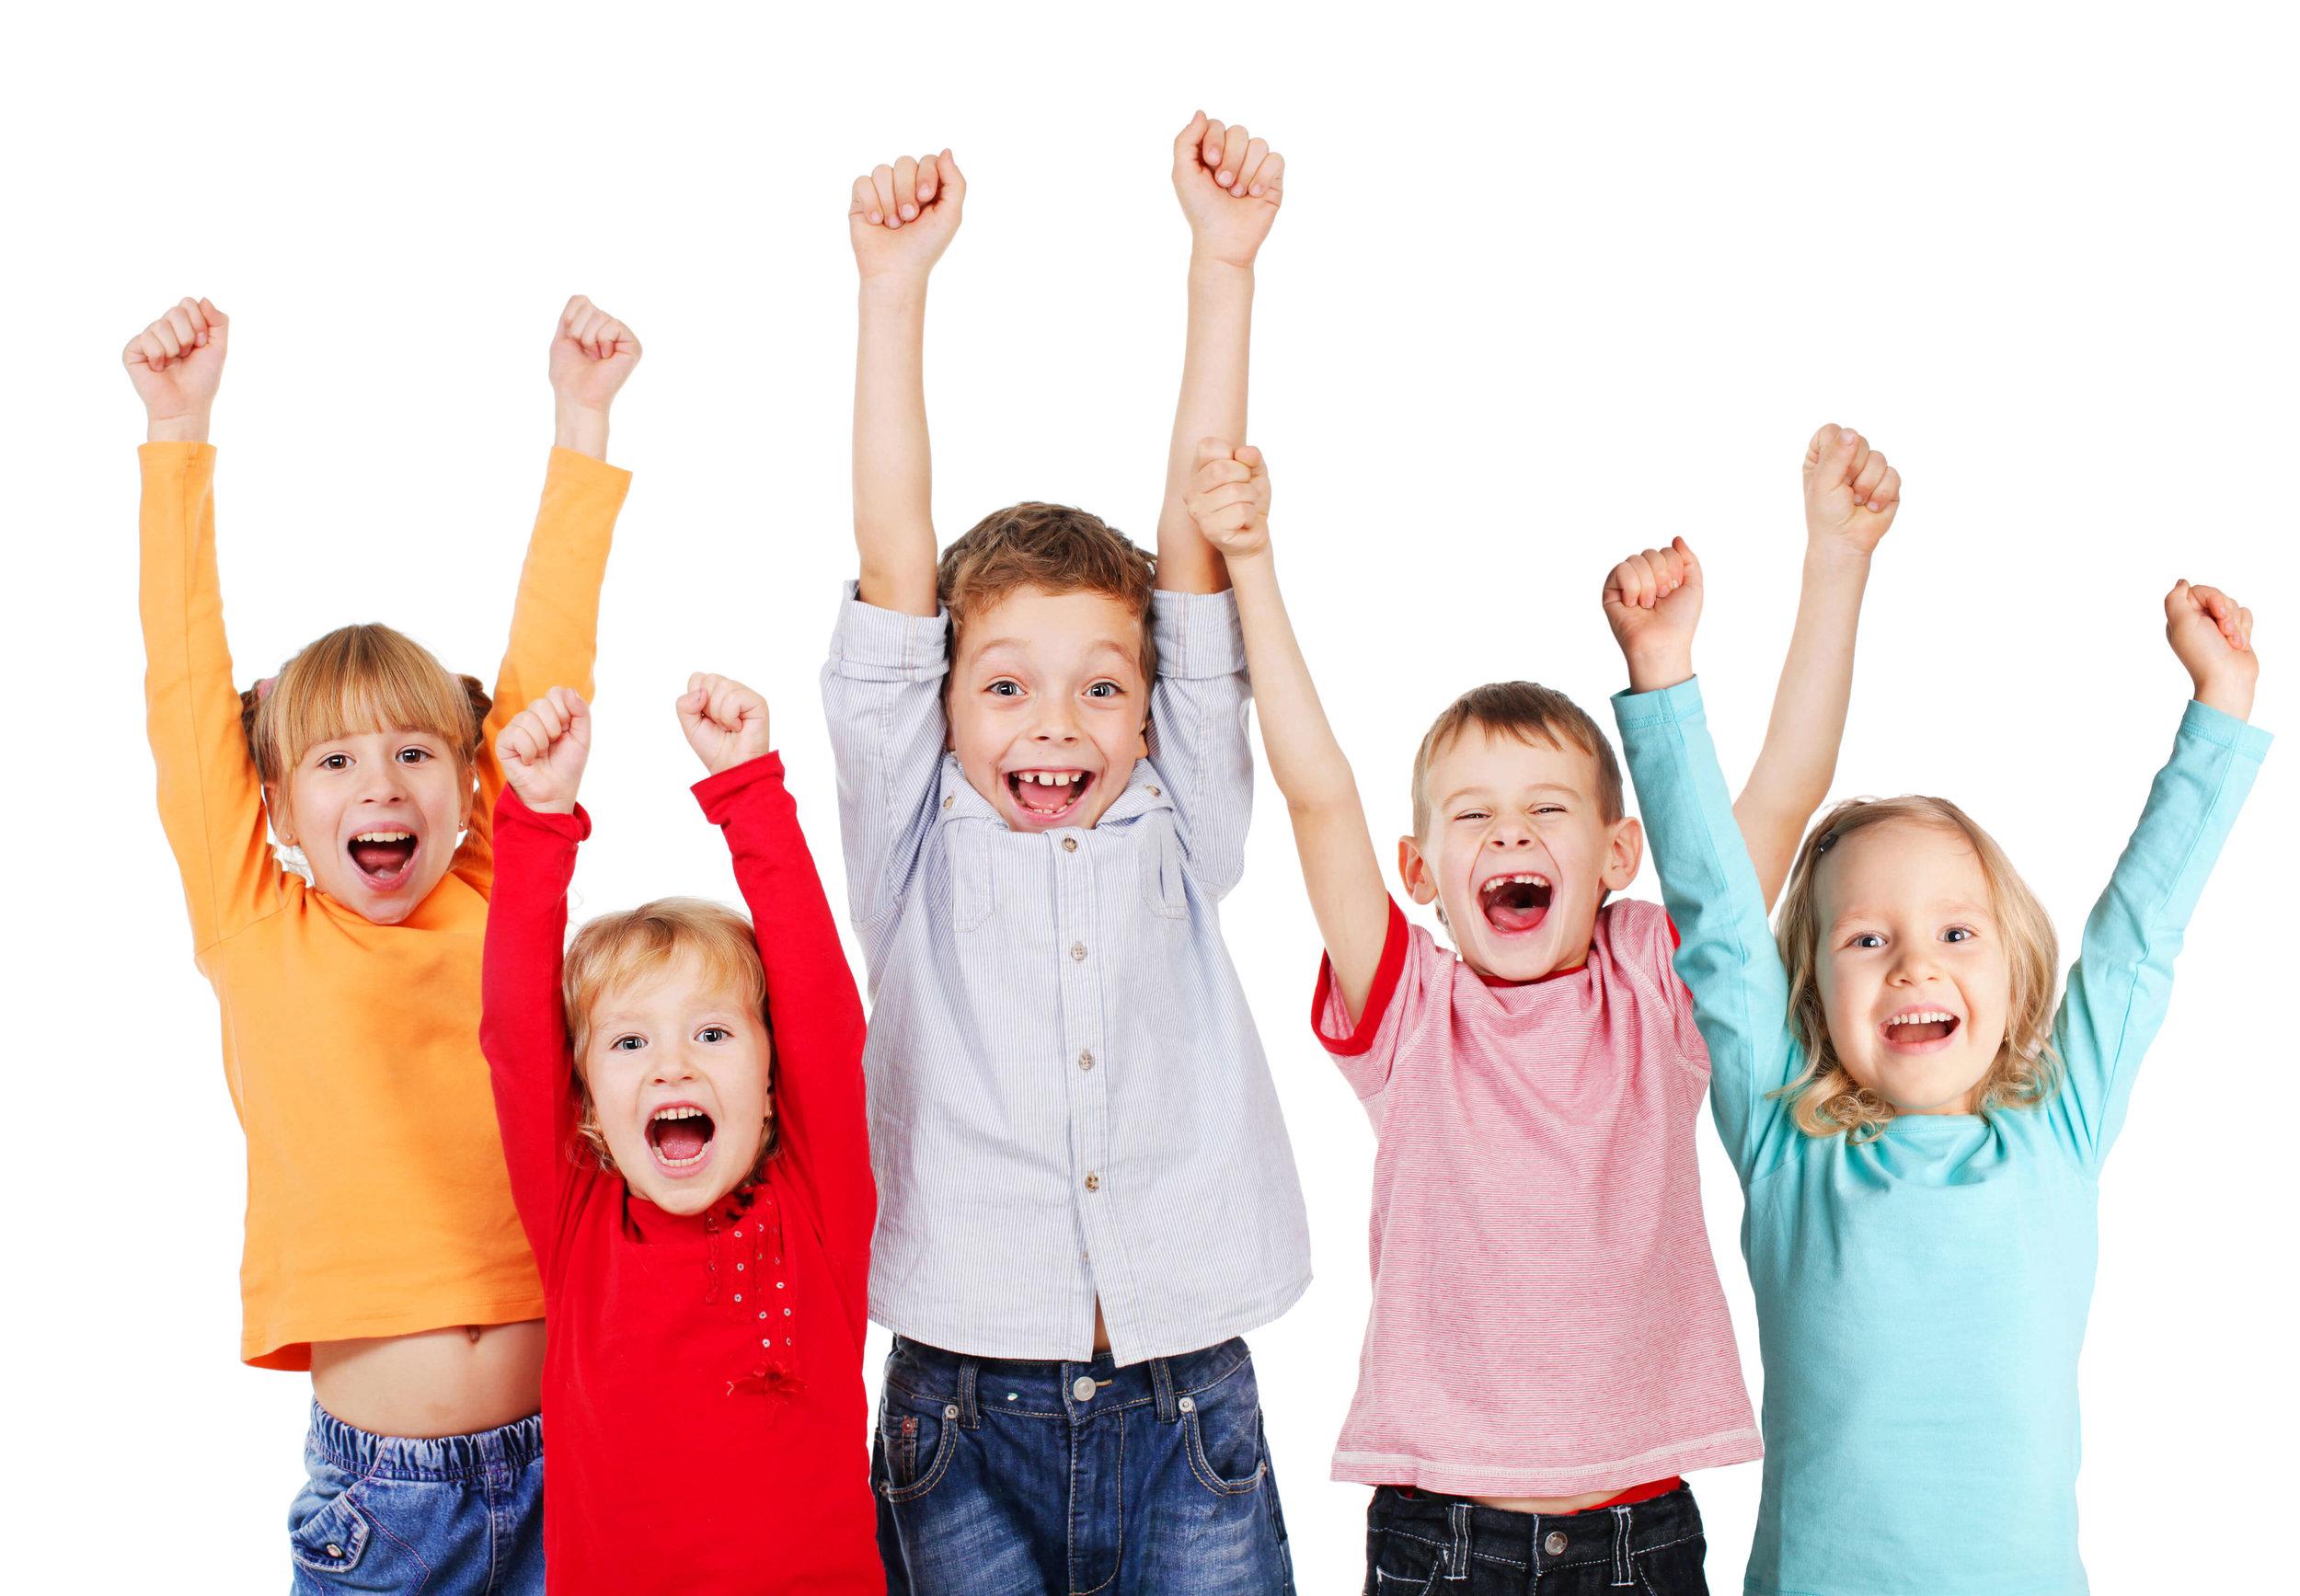 Children and Adolescent School Programs